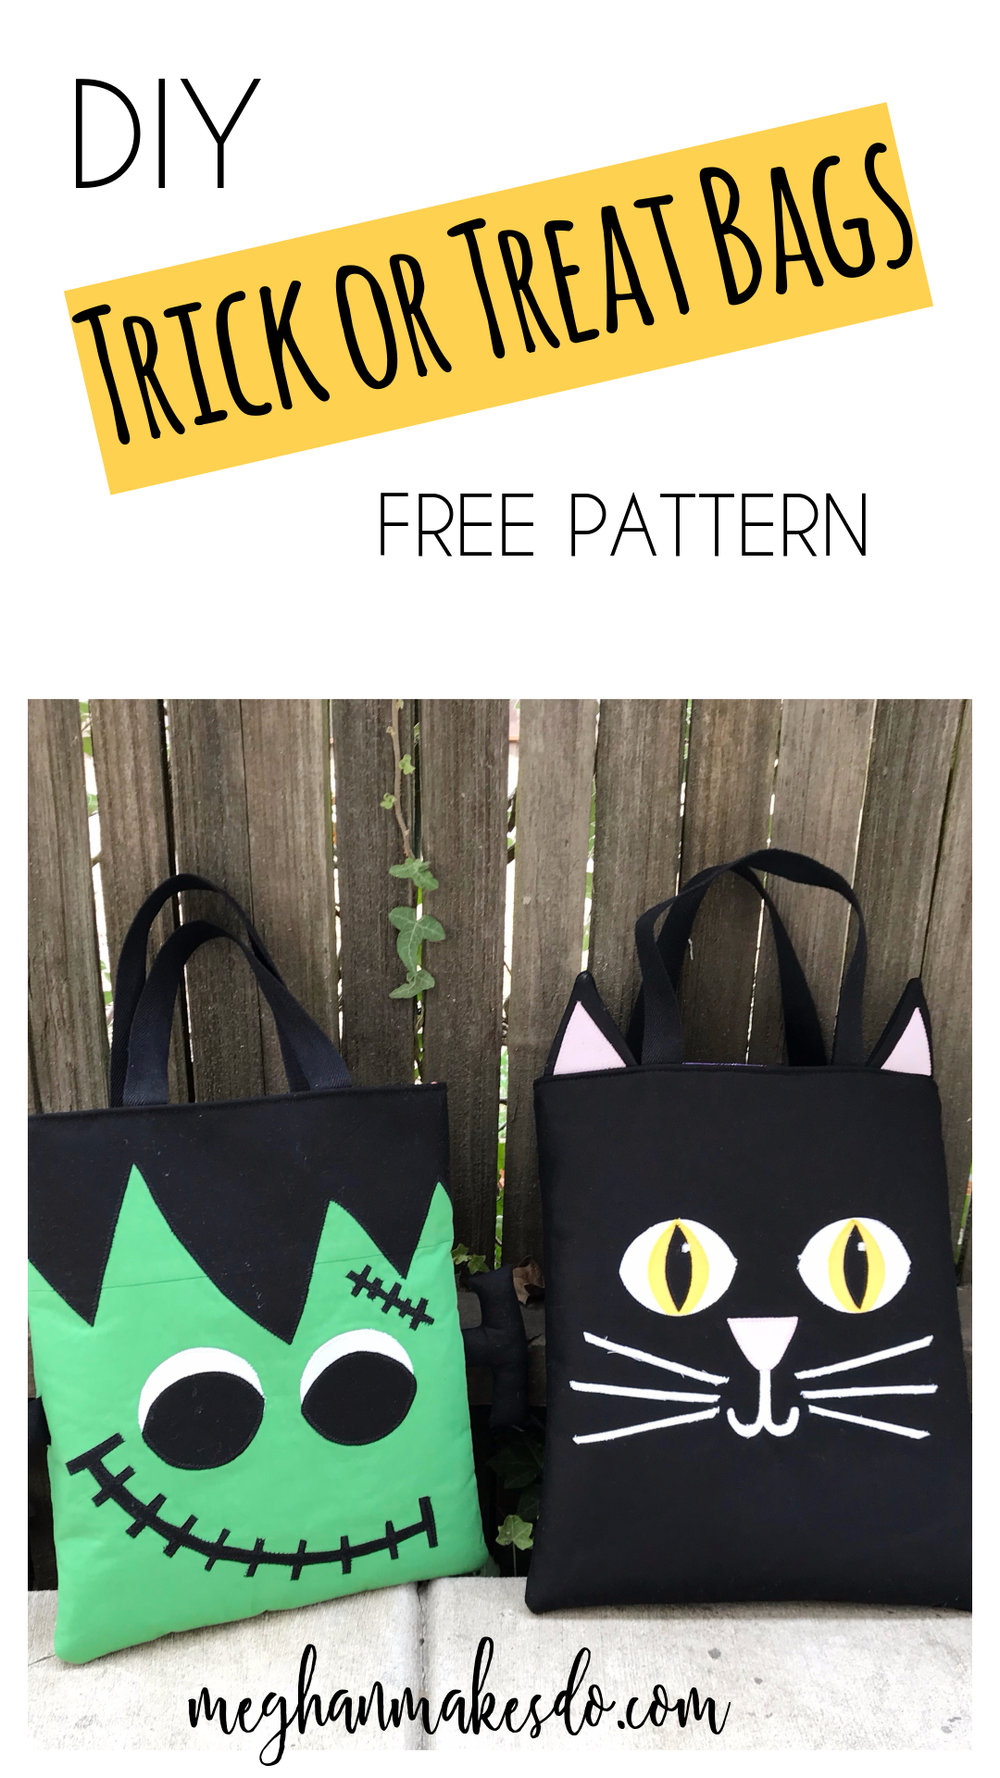 trick or treat bags 2.jpg